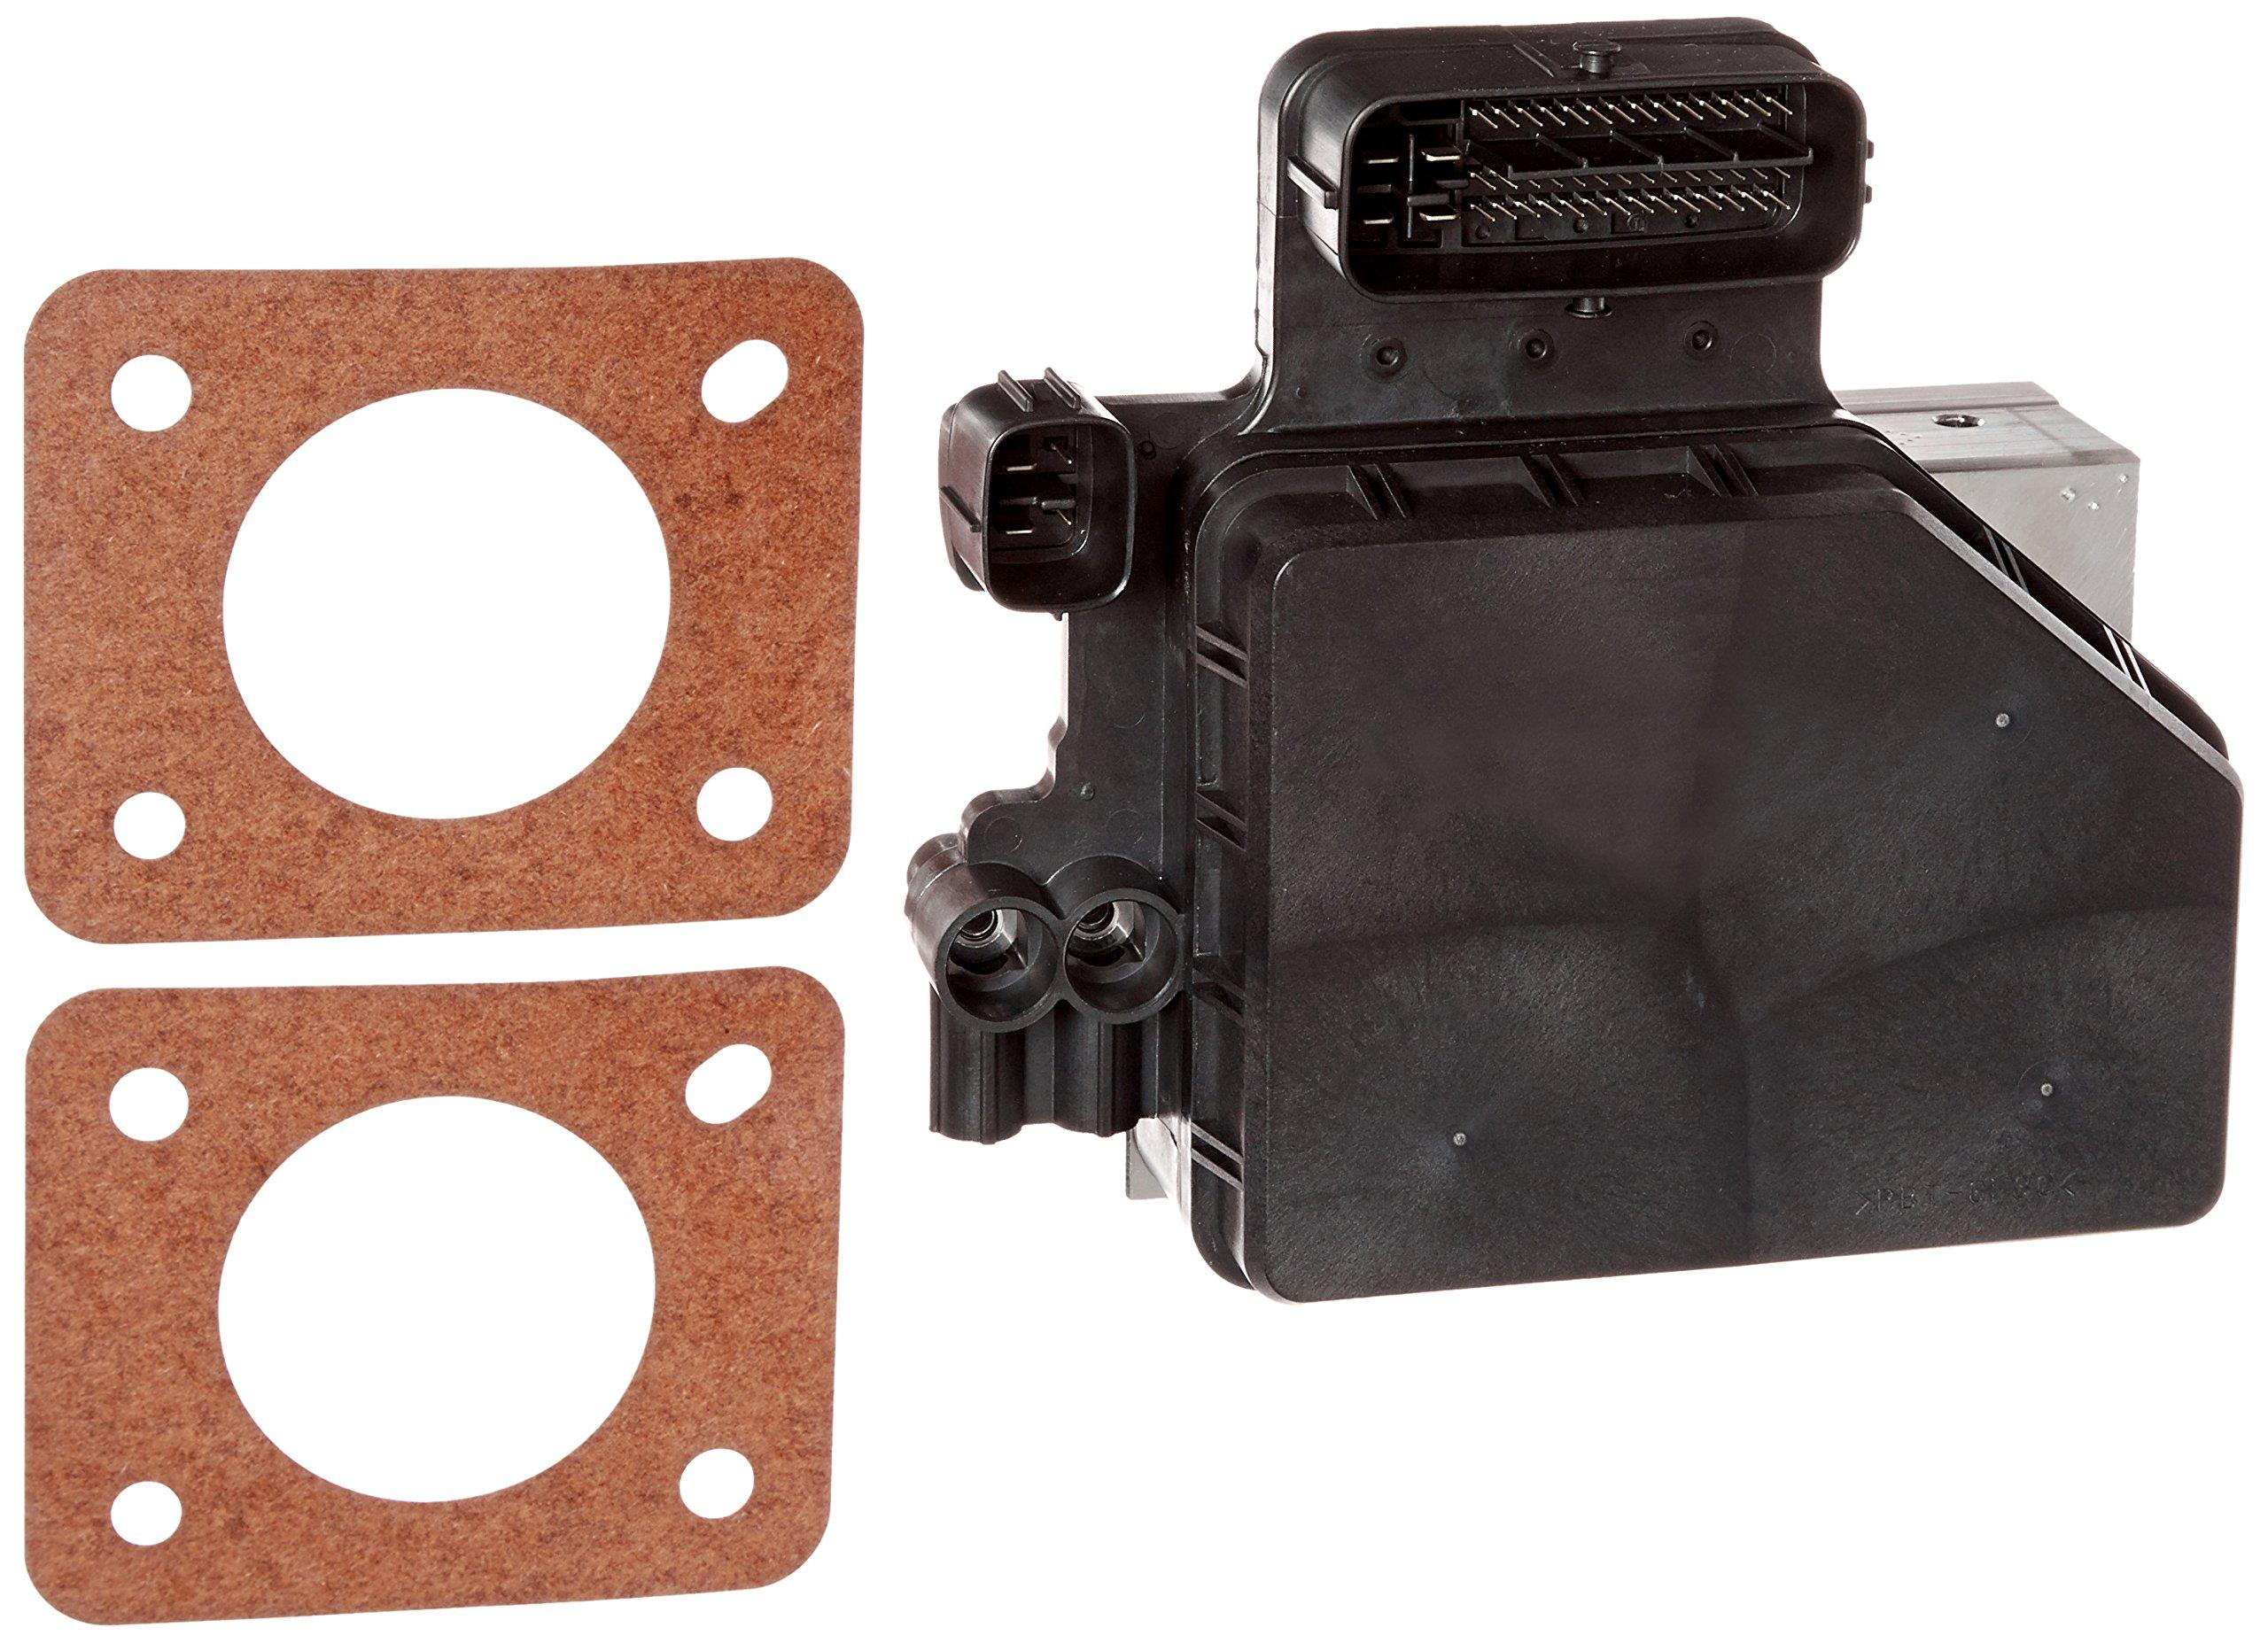 ACDelco 25939761 GM Original Equipment Electronic Brake Control Module with Brake Pressure Modulator Valve by ACDelco